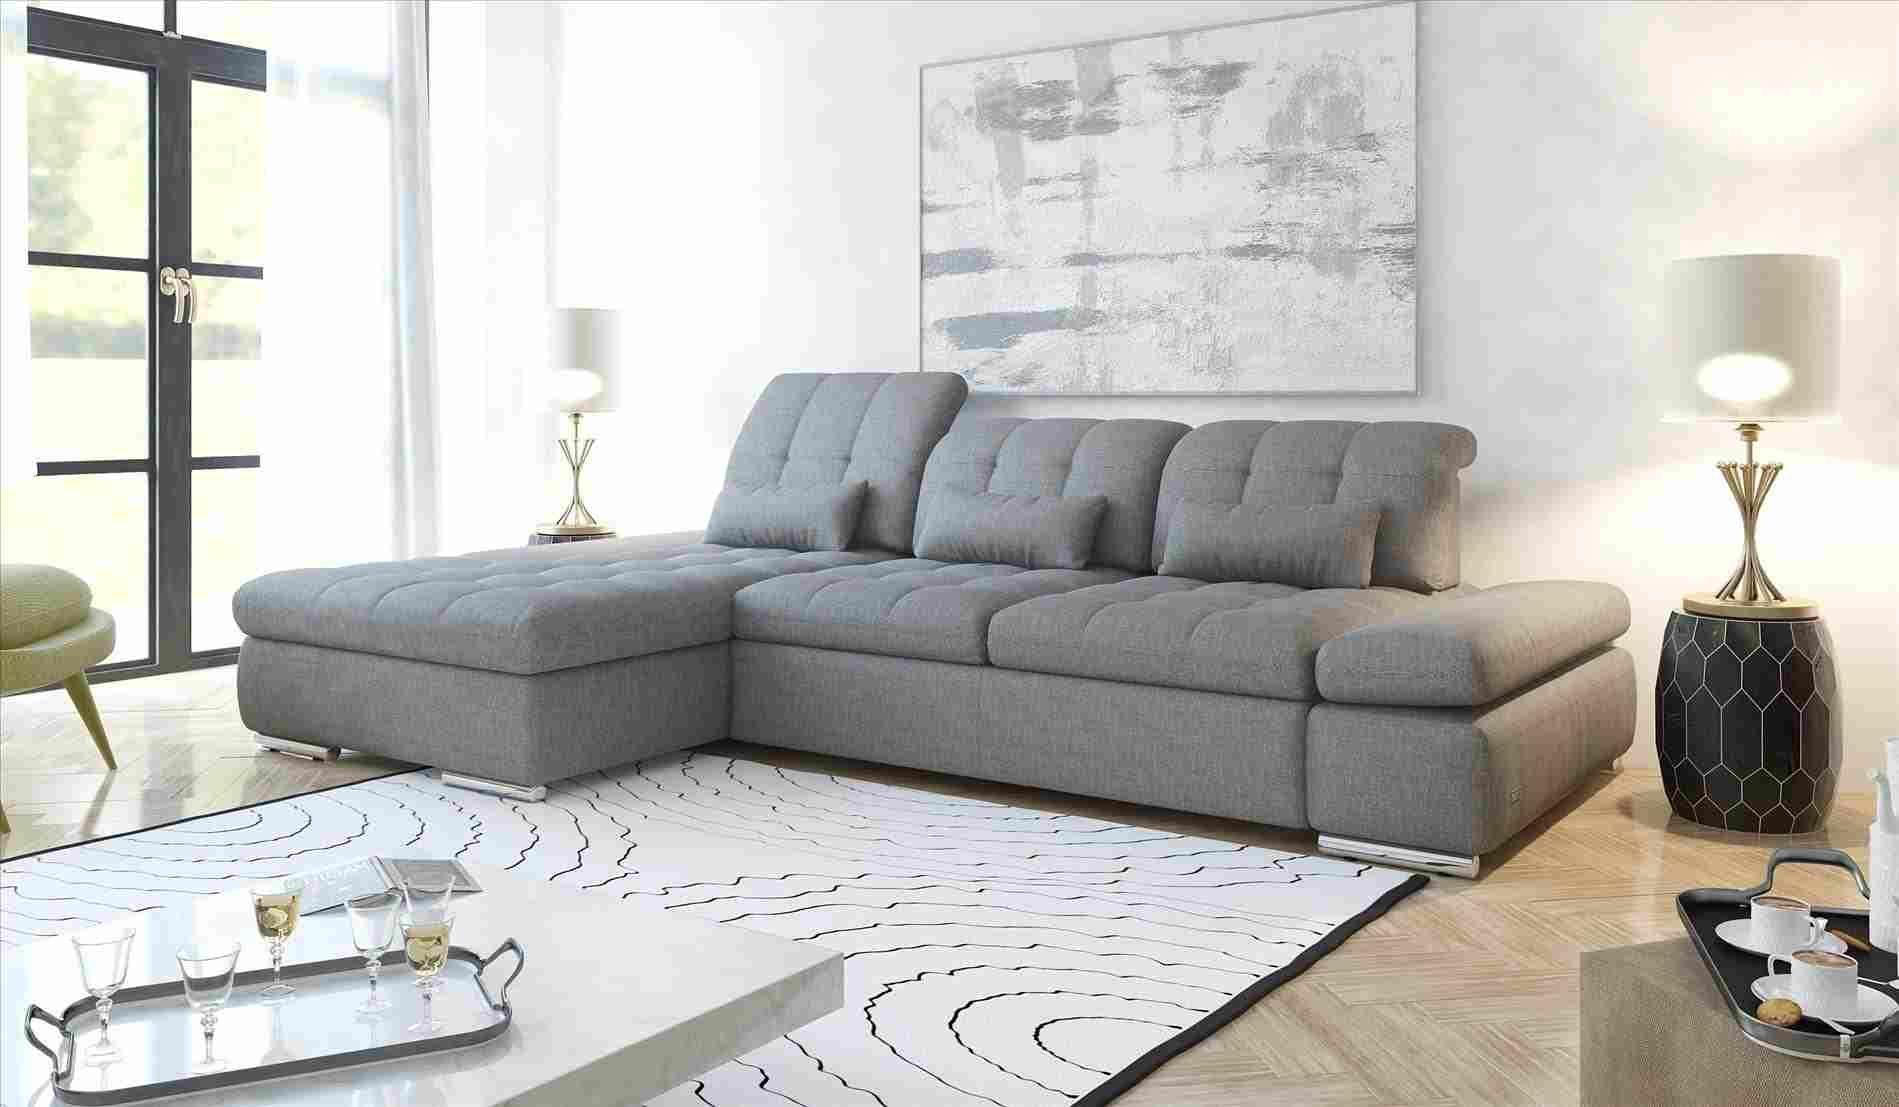 sectional sofas vt Sectional sofa, Sectional, Sectional